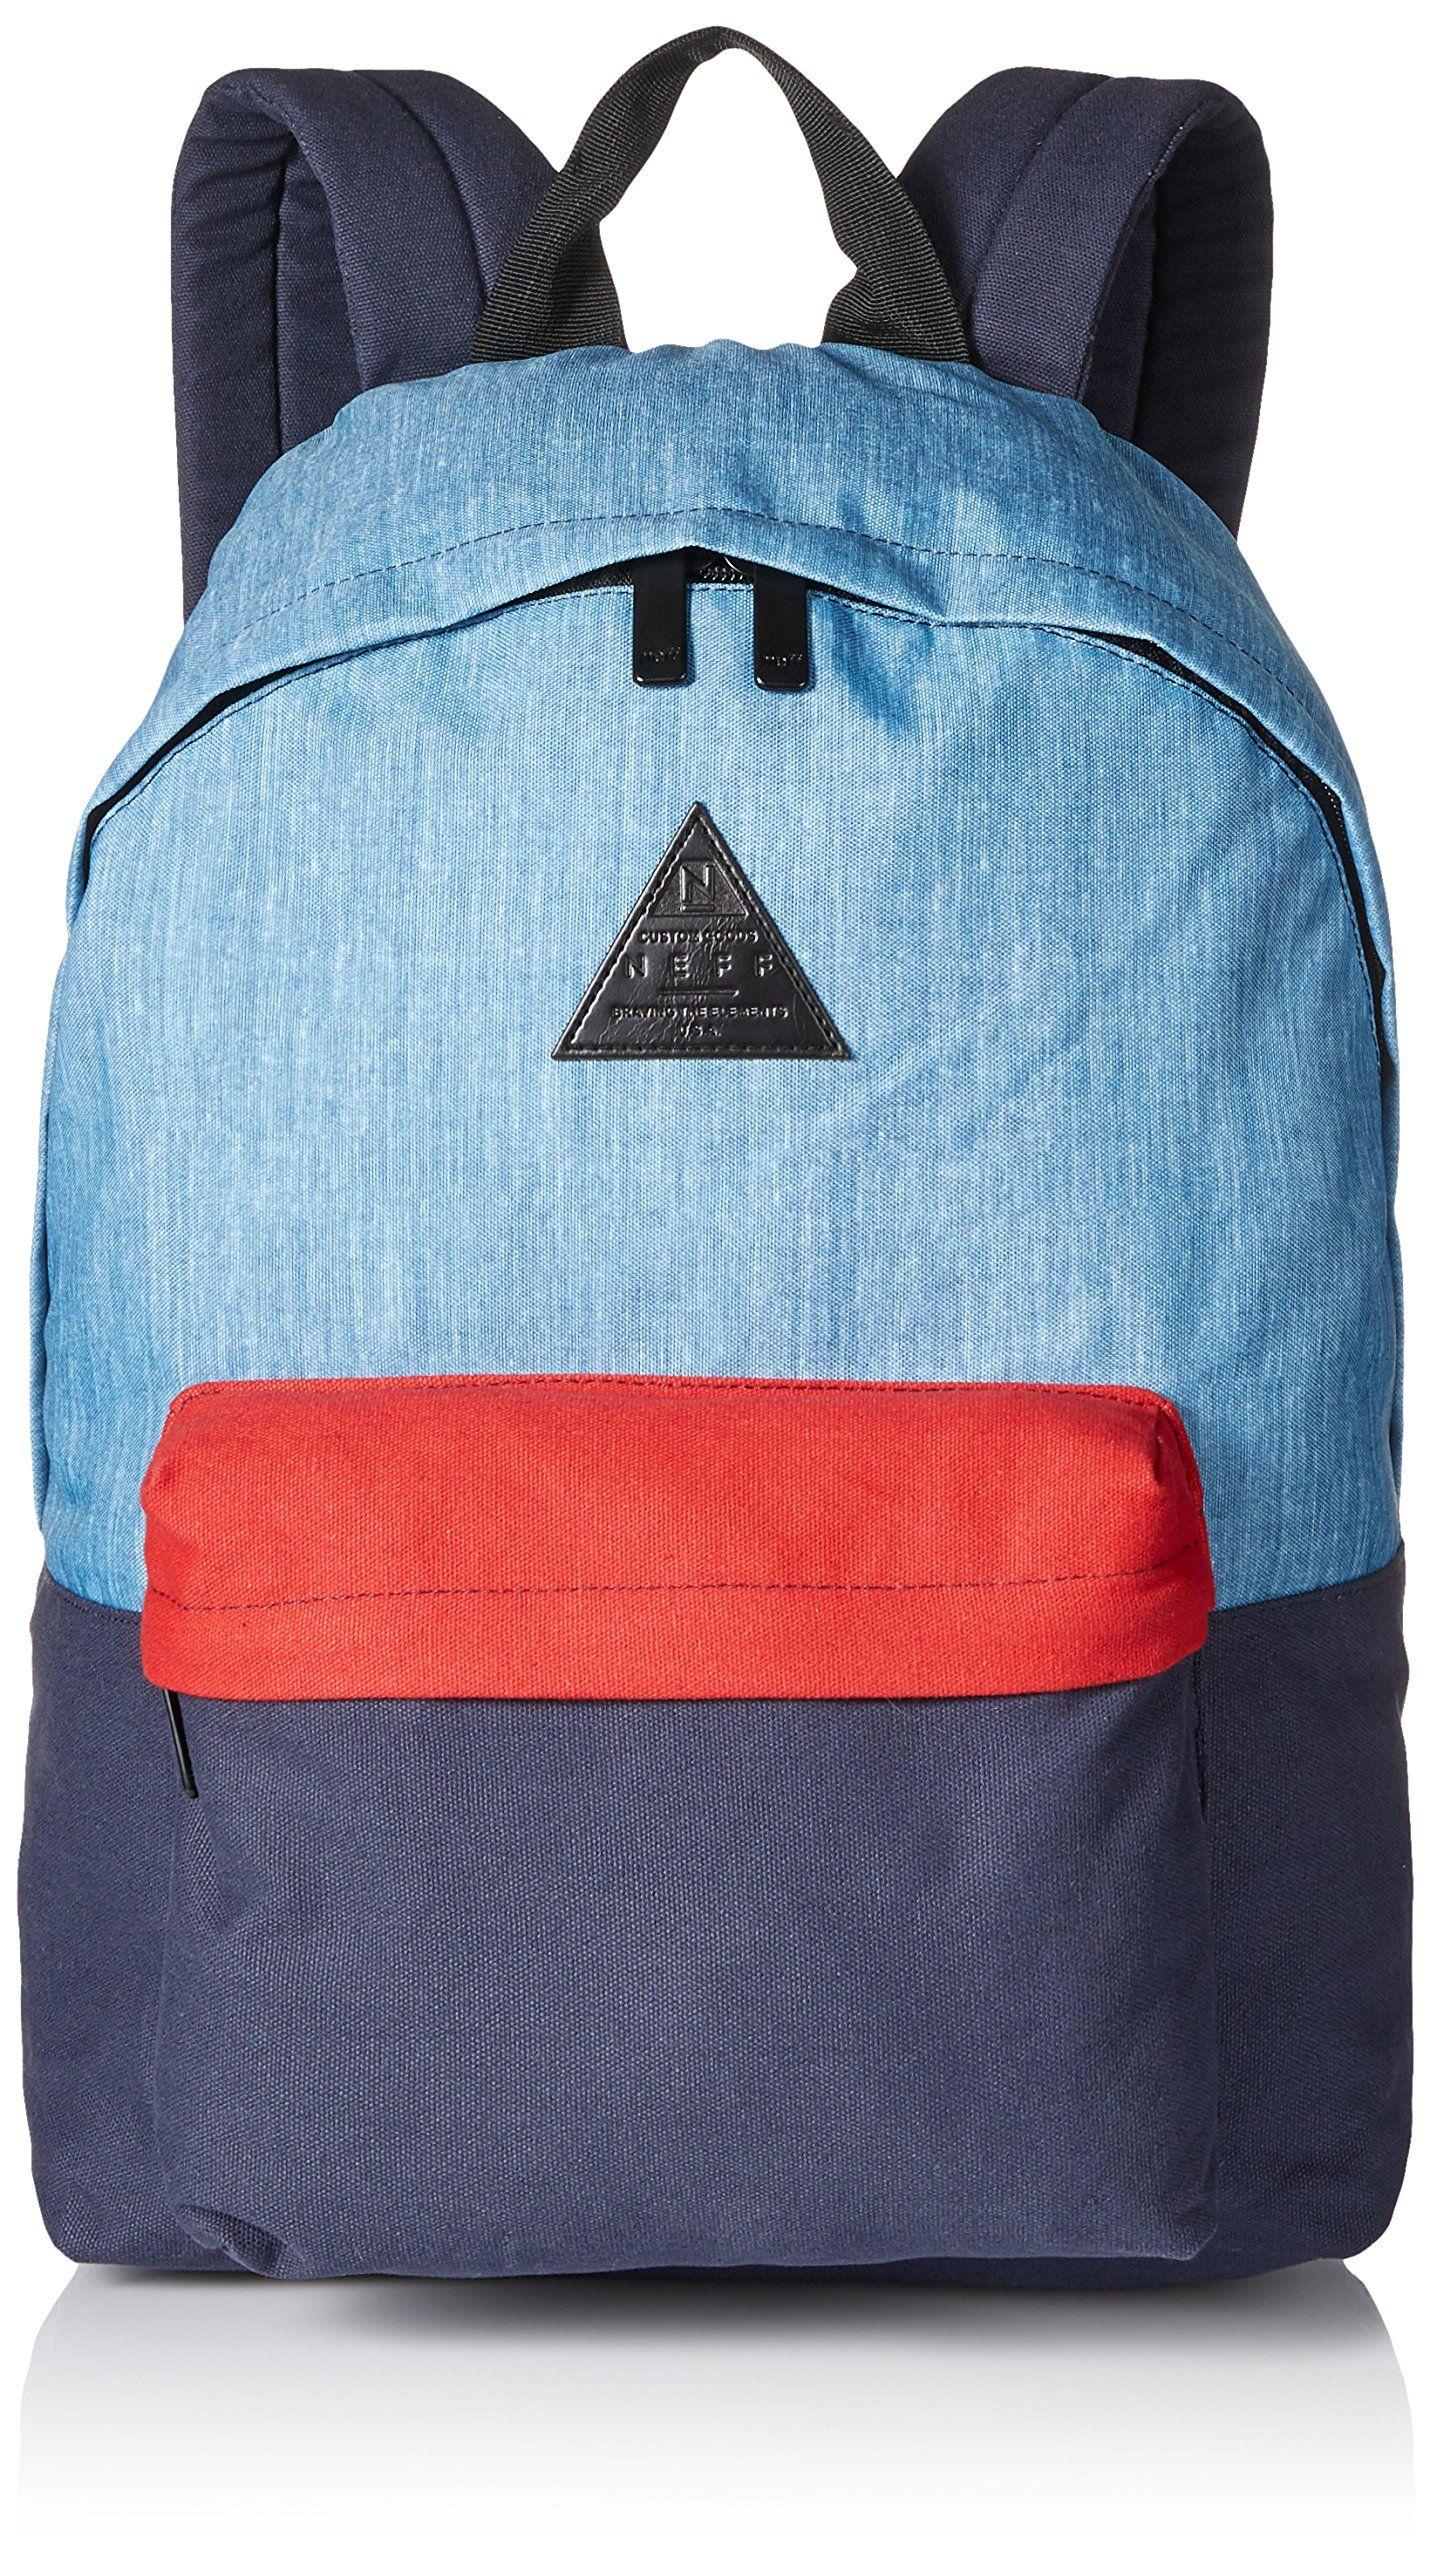 674443aa8d5 Neff Men s Professor Backpack